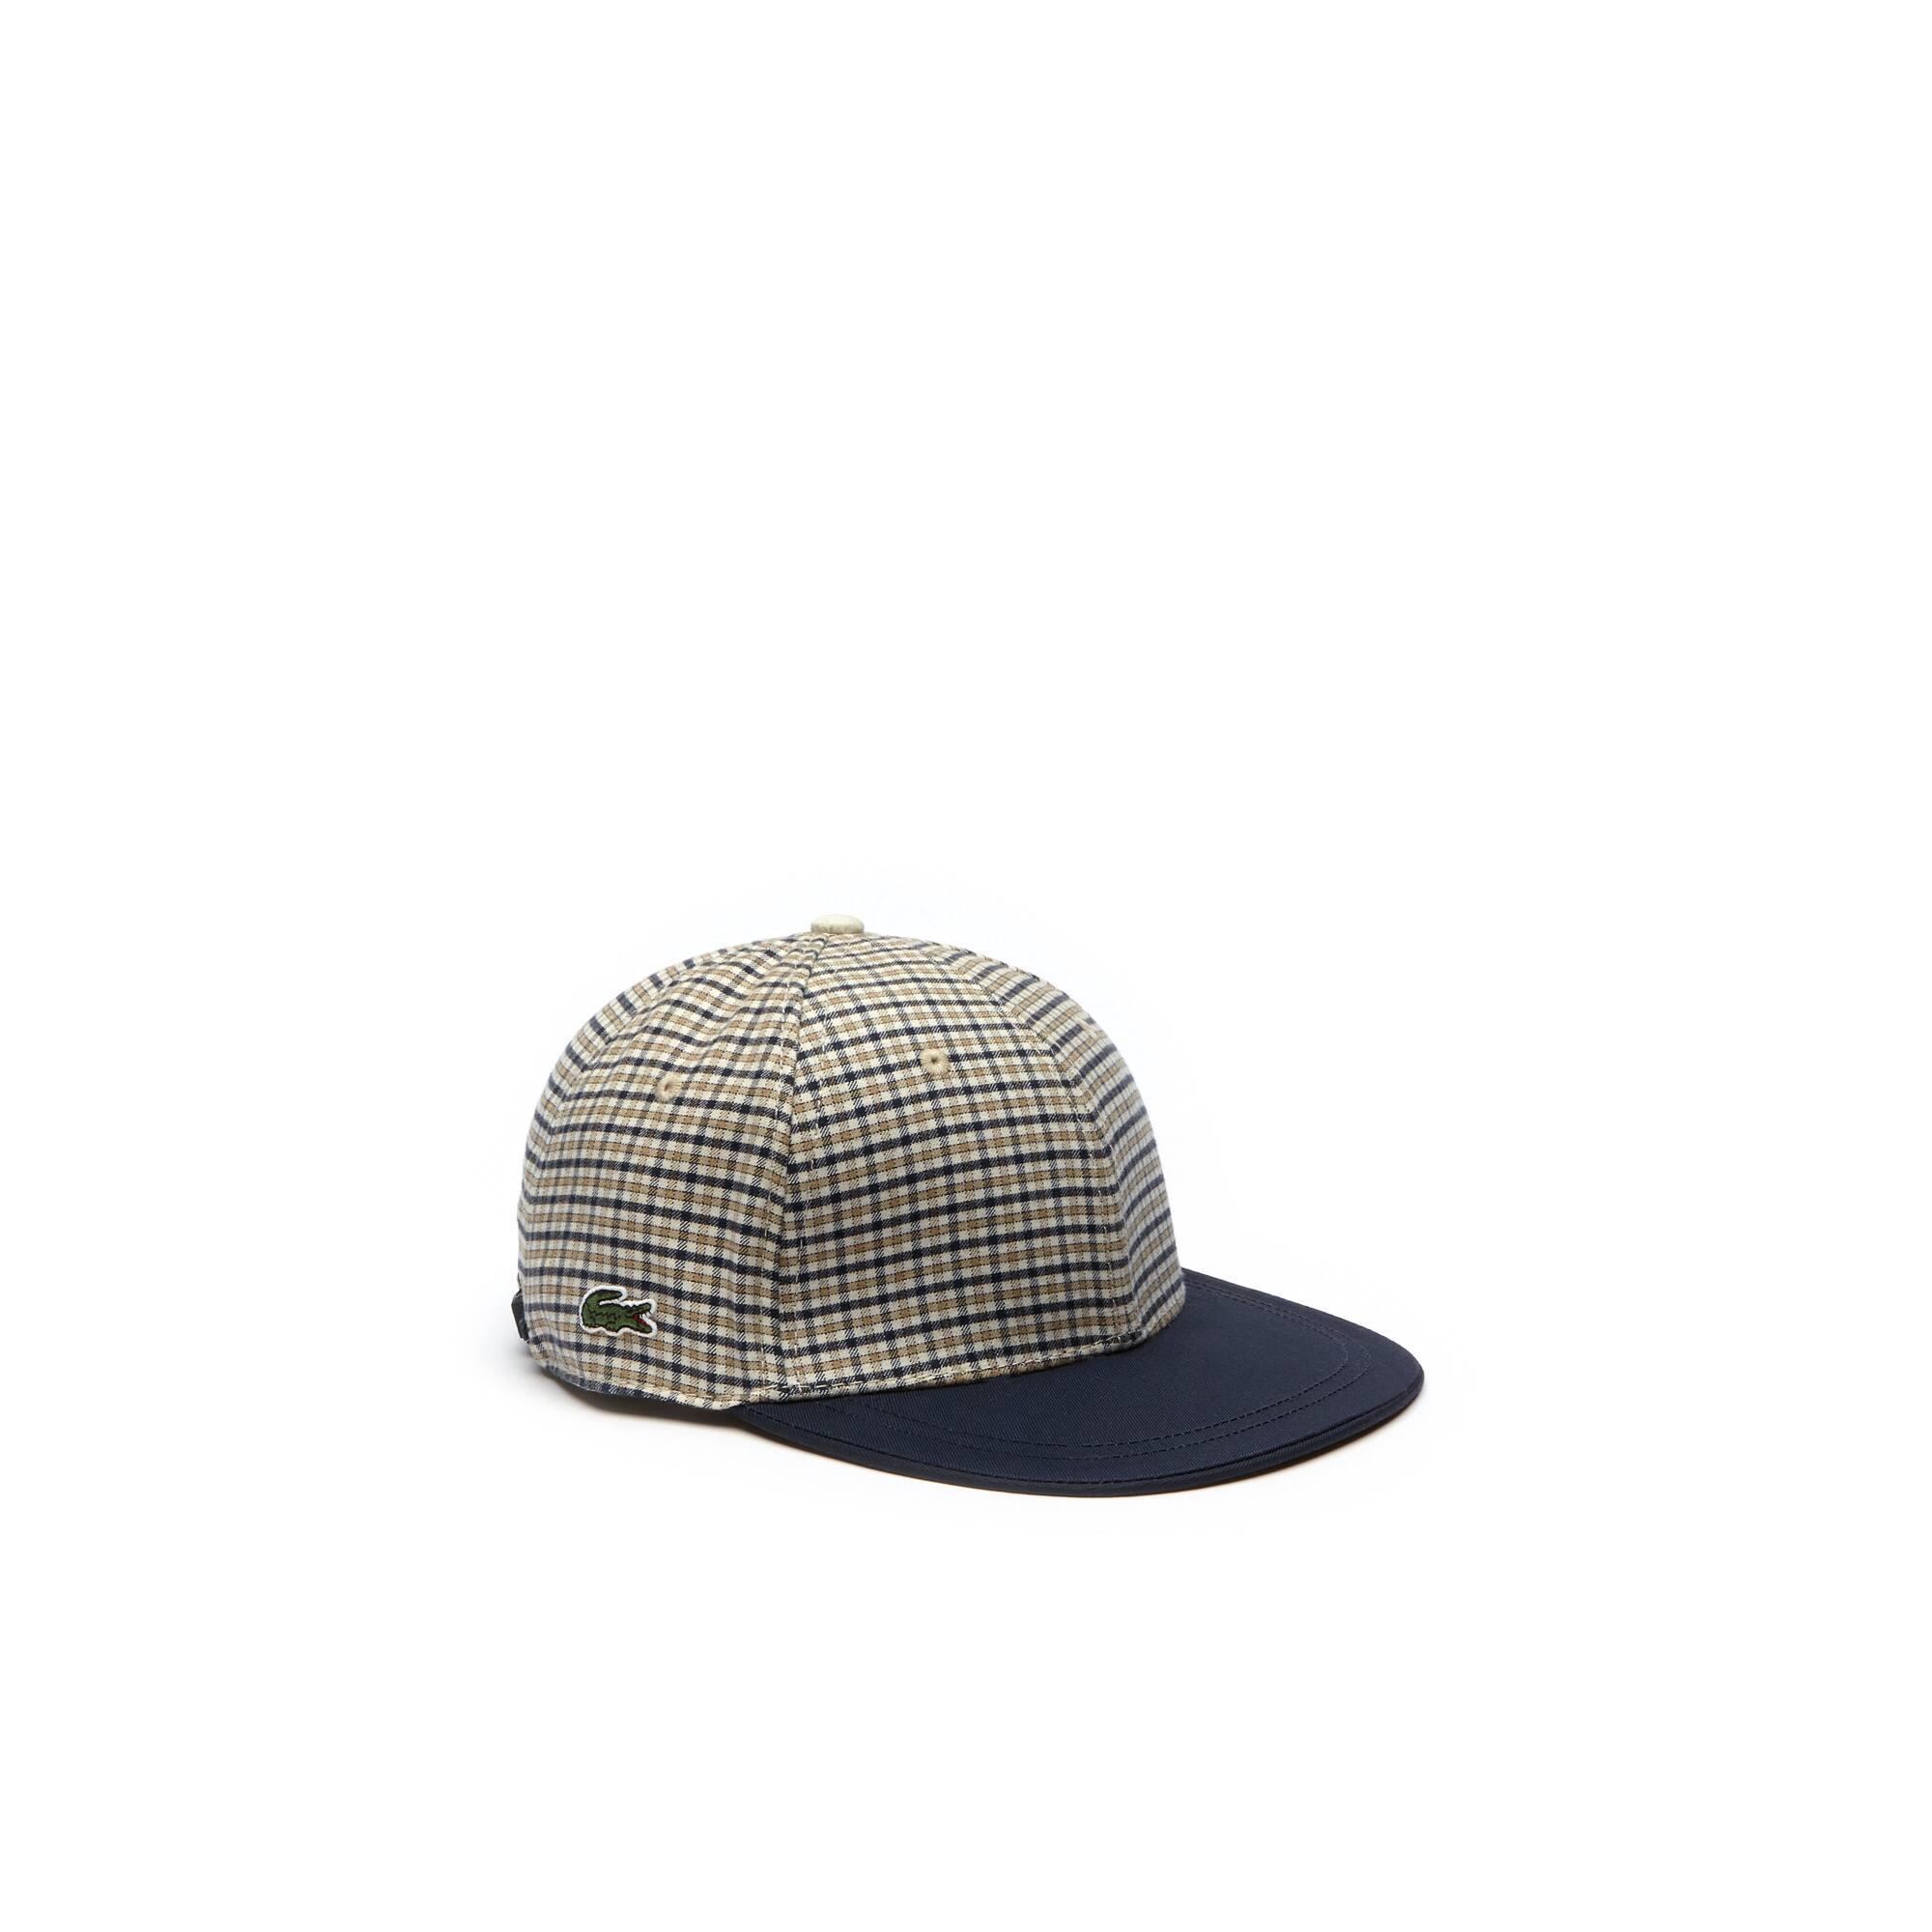 Lacoste LIVE Contrasting Visor Check Flannel Cap 1c7688d776a6